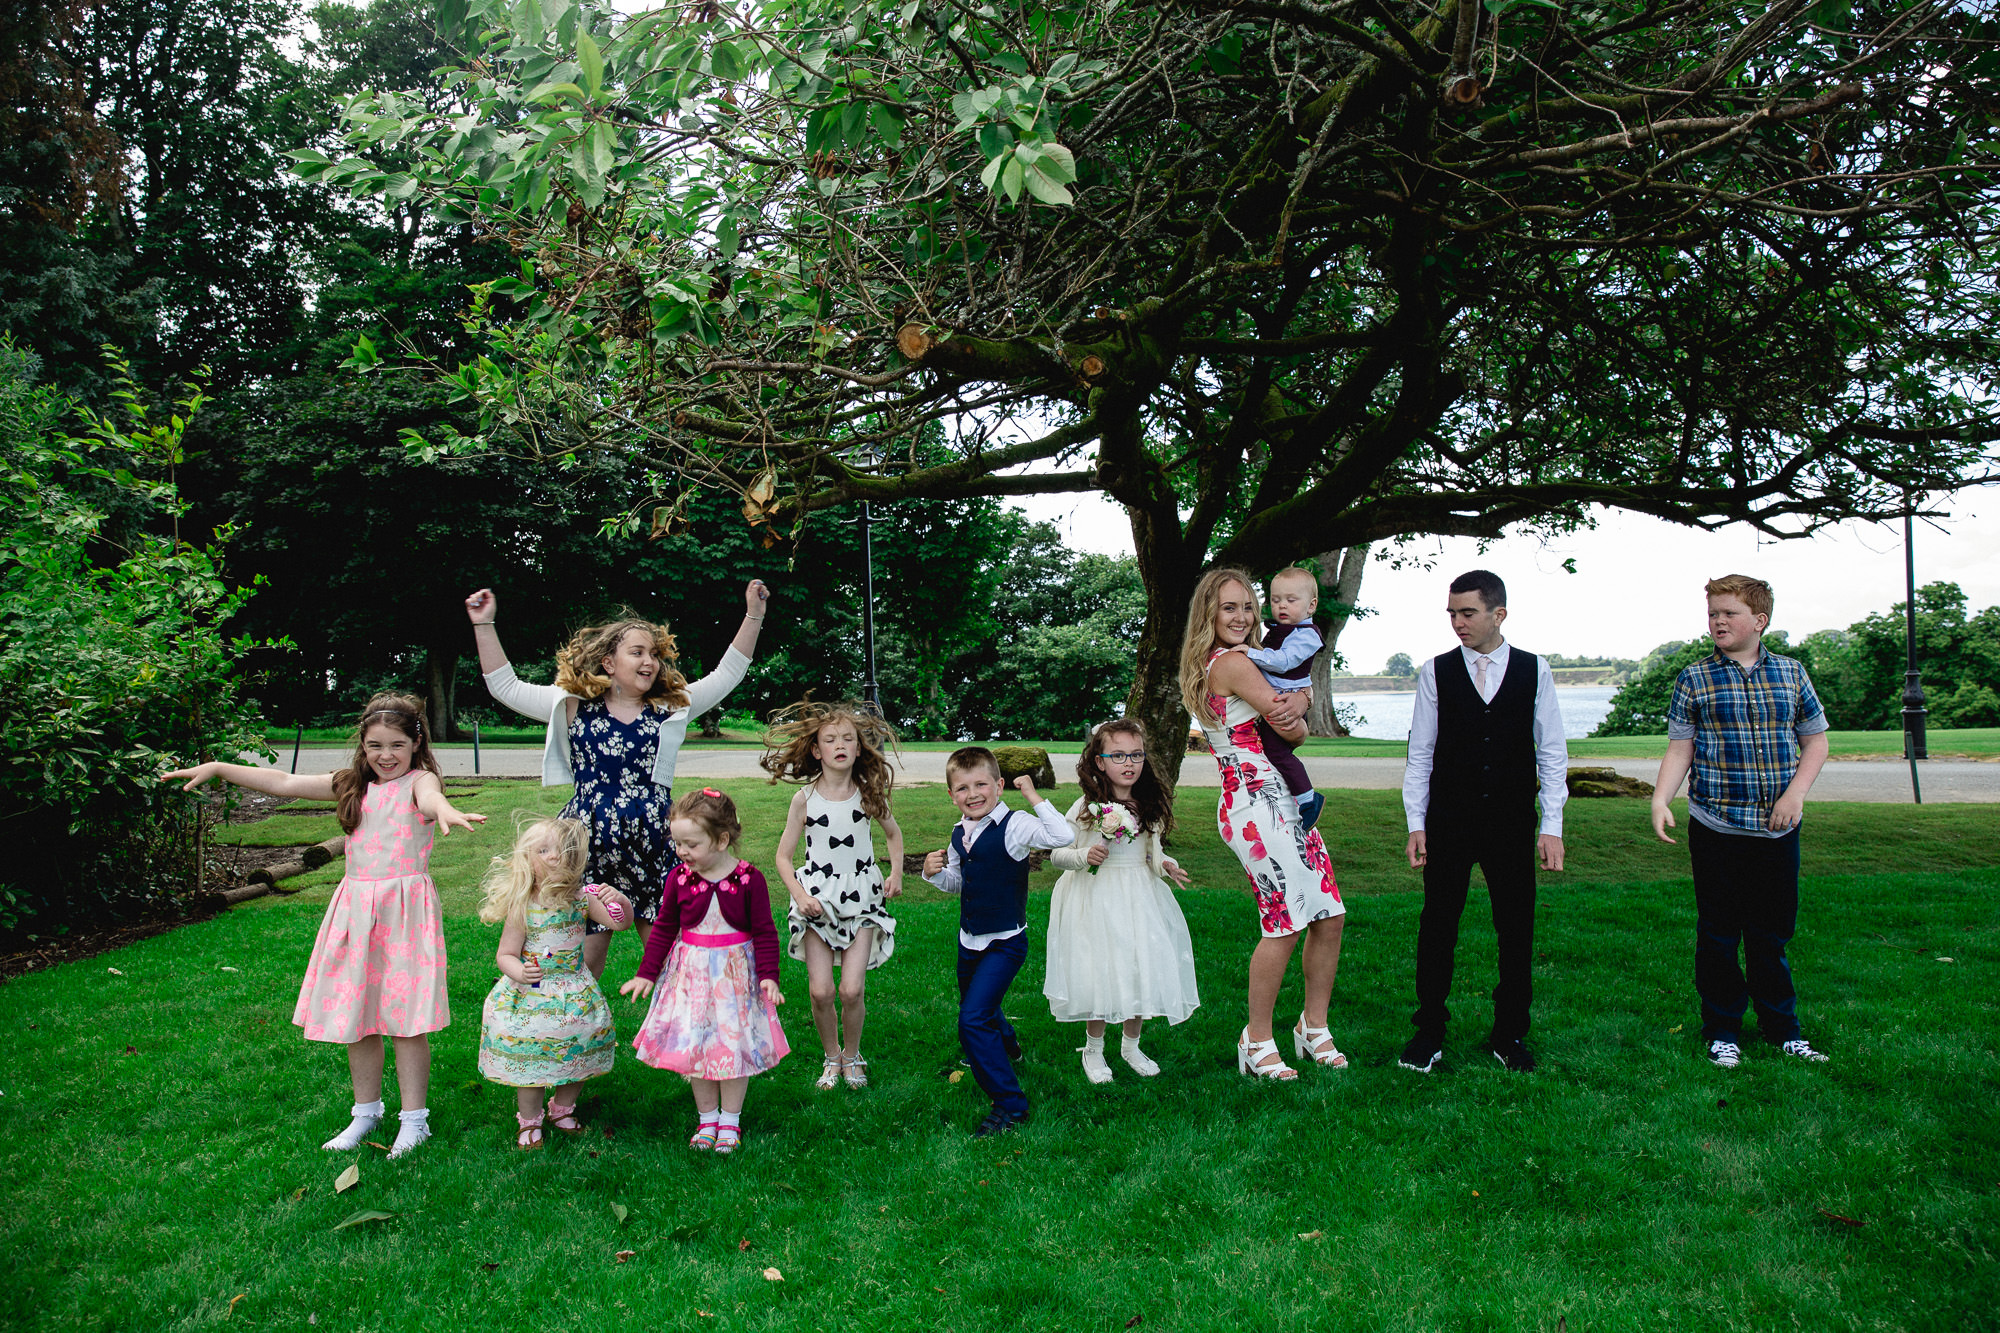 CLAIREBYRNEPHOTOGRAPHY-WEDDING-Ireland-tulffaris-alternative-fun-Lisa-terry-21.jpg